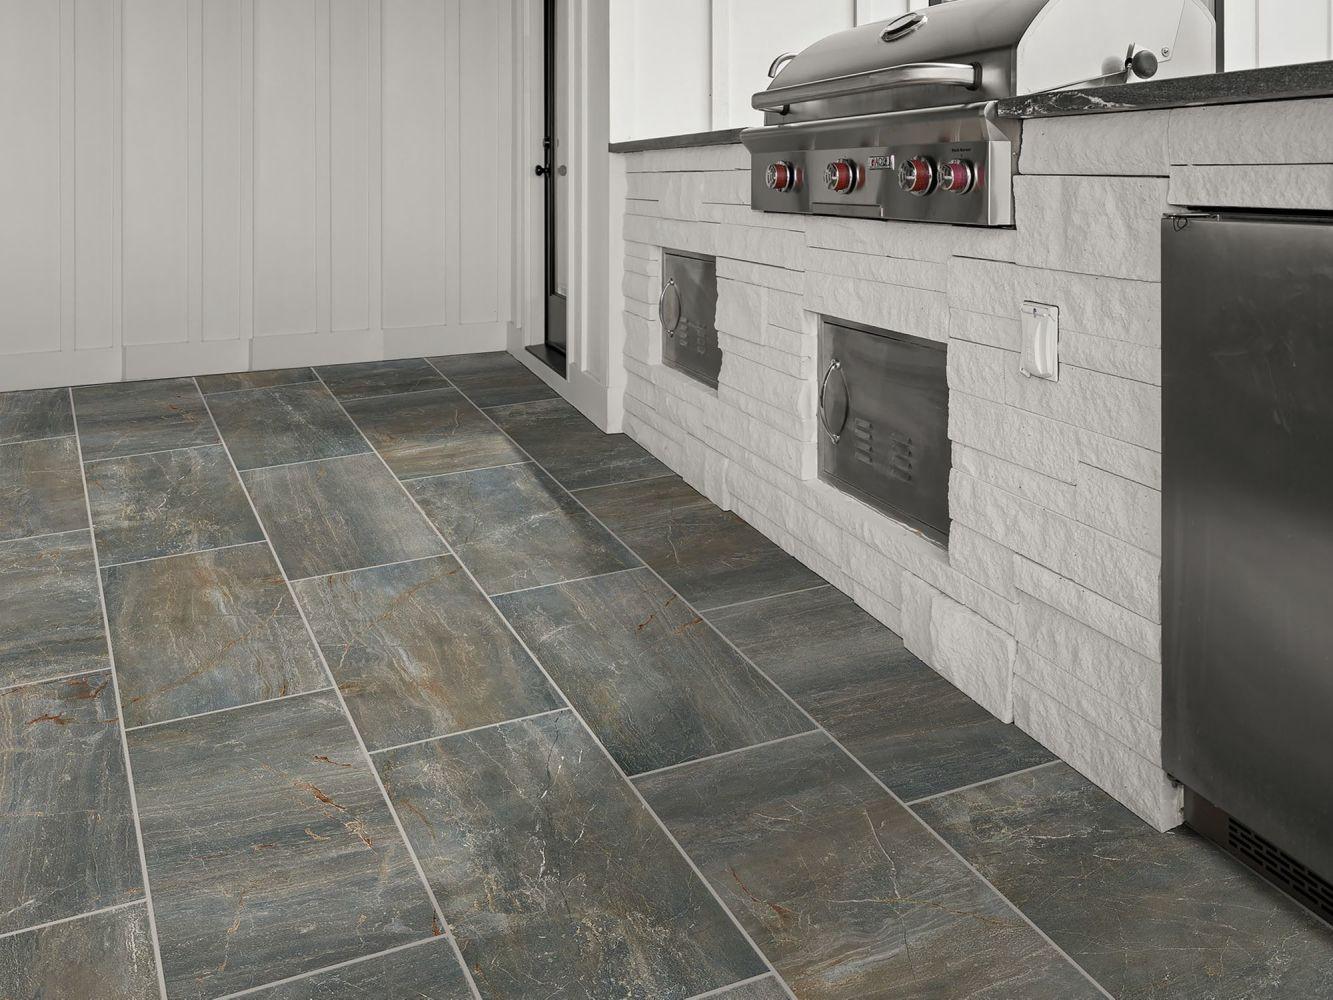 Shaw Floors Ceramic Solutions Trace 12×24 Matte Gunmetal 00500_318TS